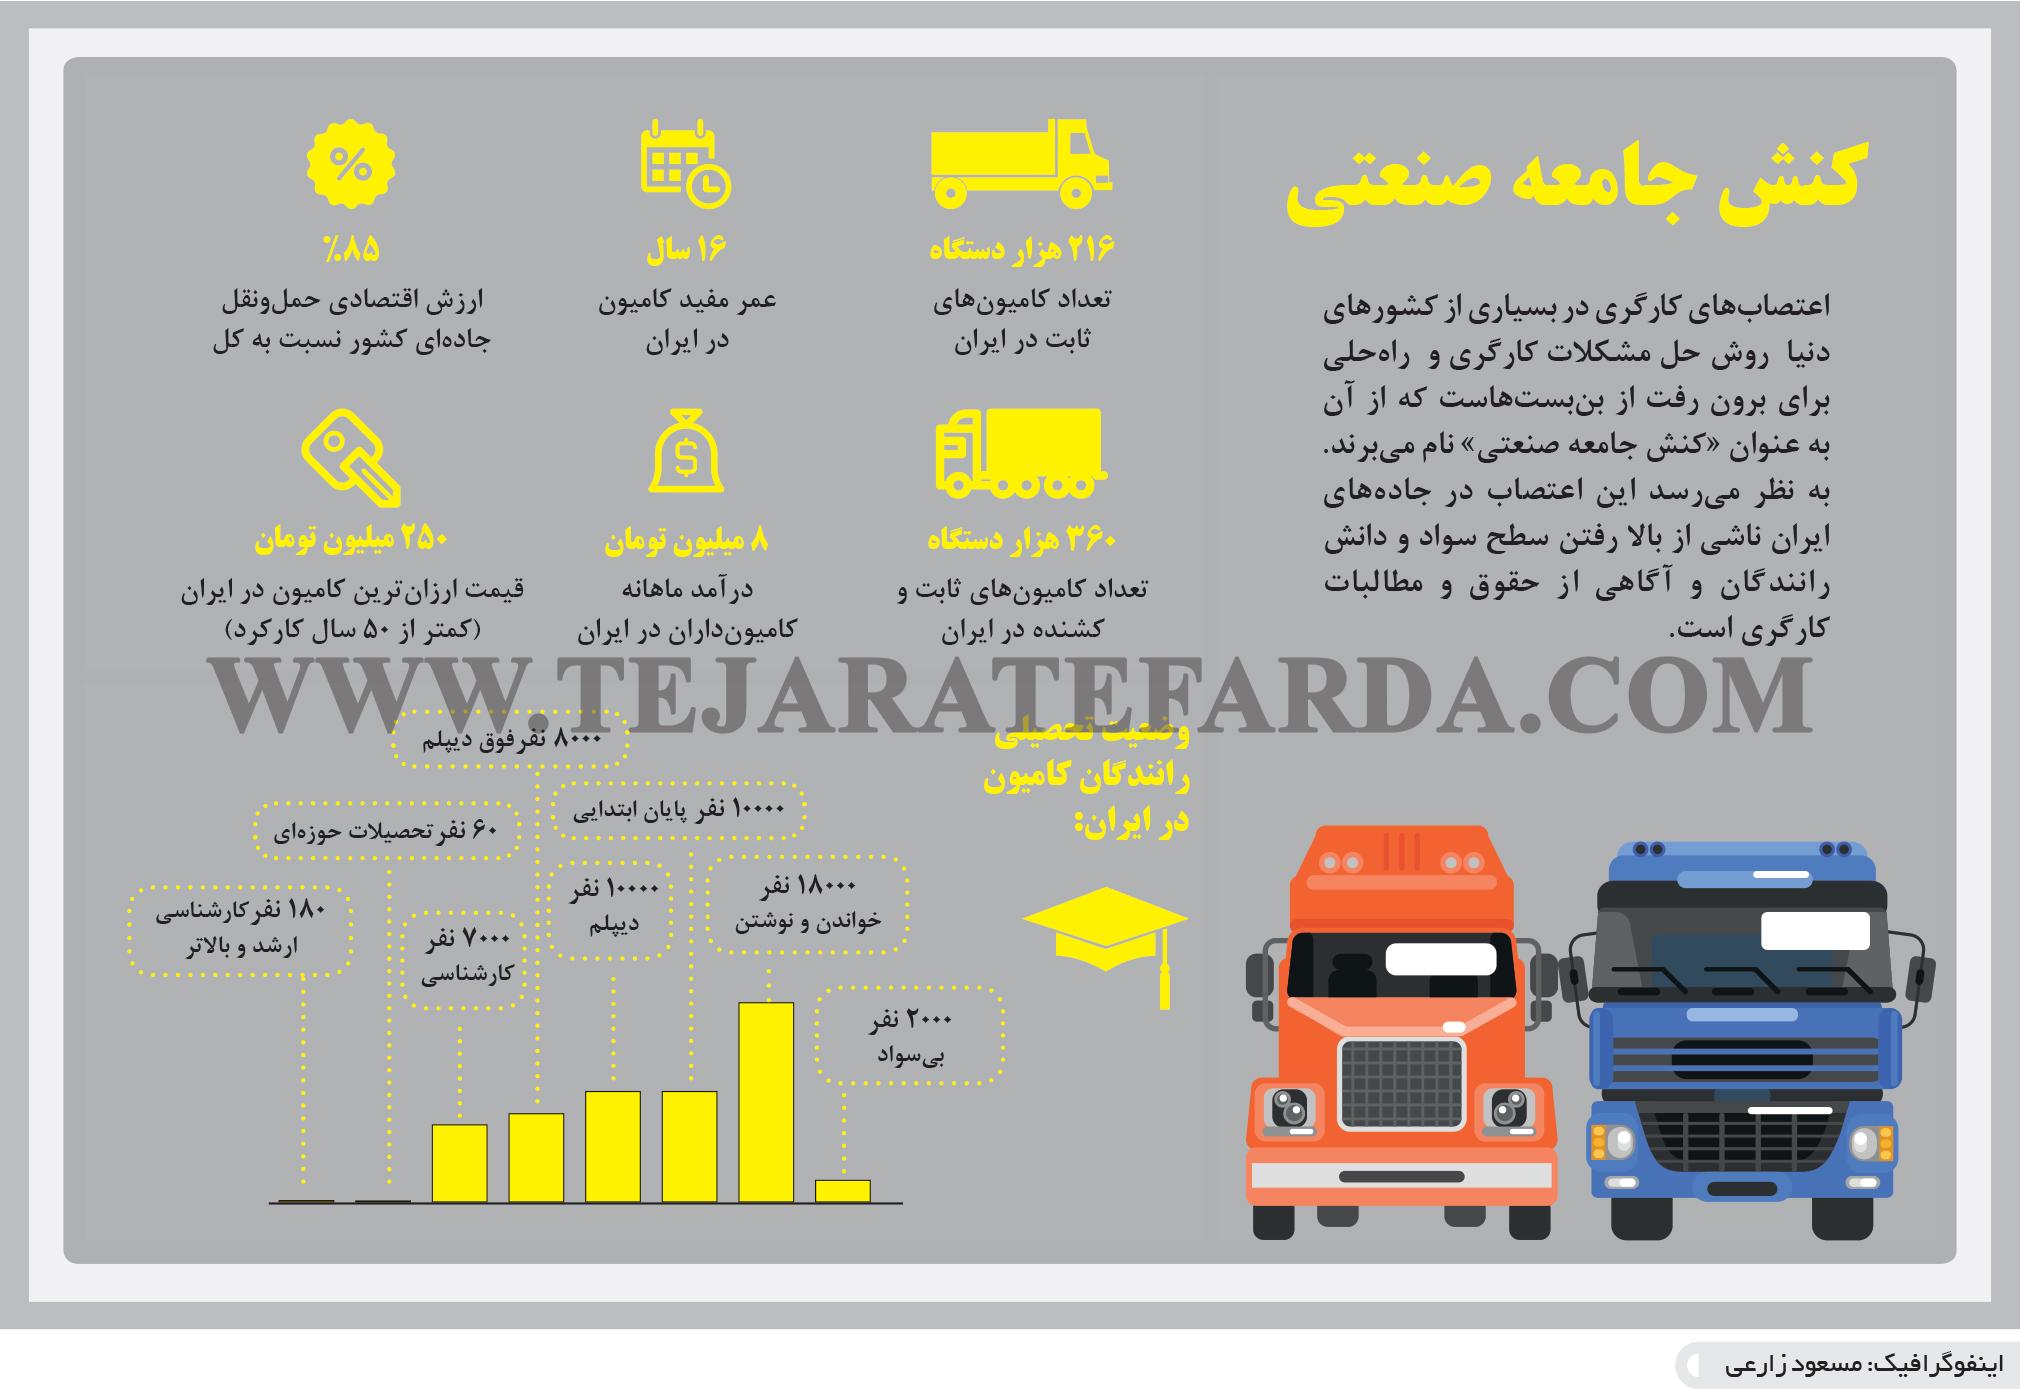 تجارت- فردا- کنش جامعه صنعتی(اینفوگرافیک)